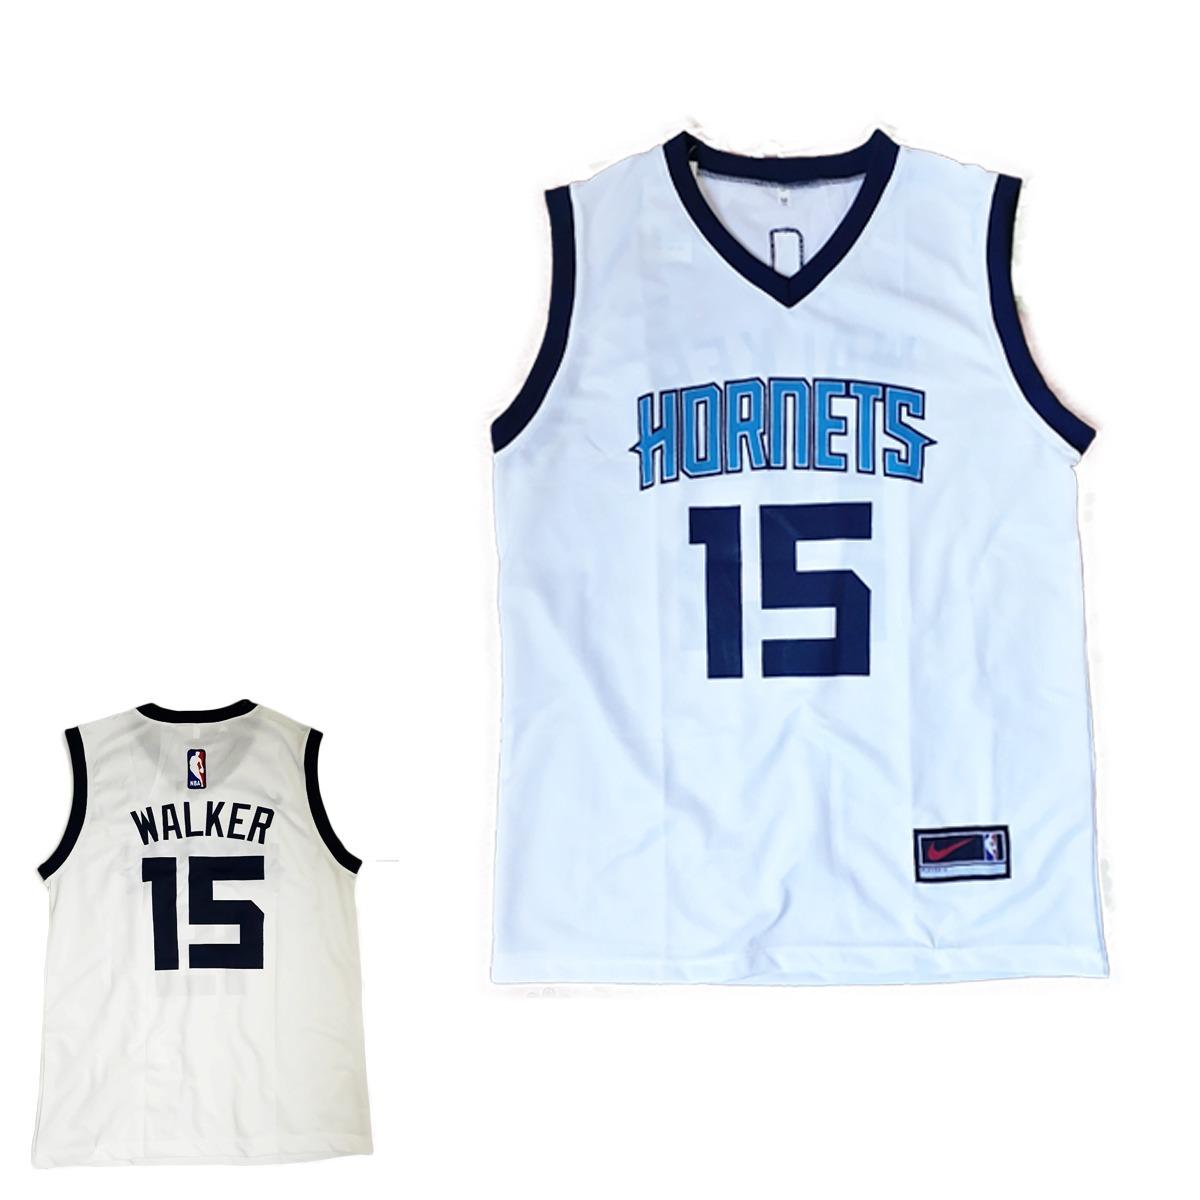 bbdd8de2f camisa regata de basquete charlotte hornets nba. Carregando zoom.